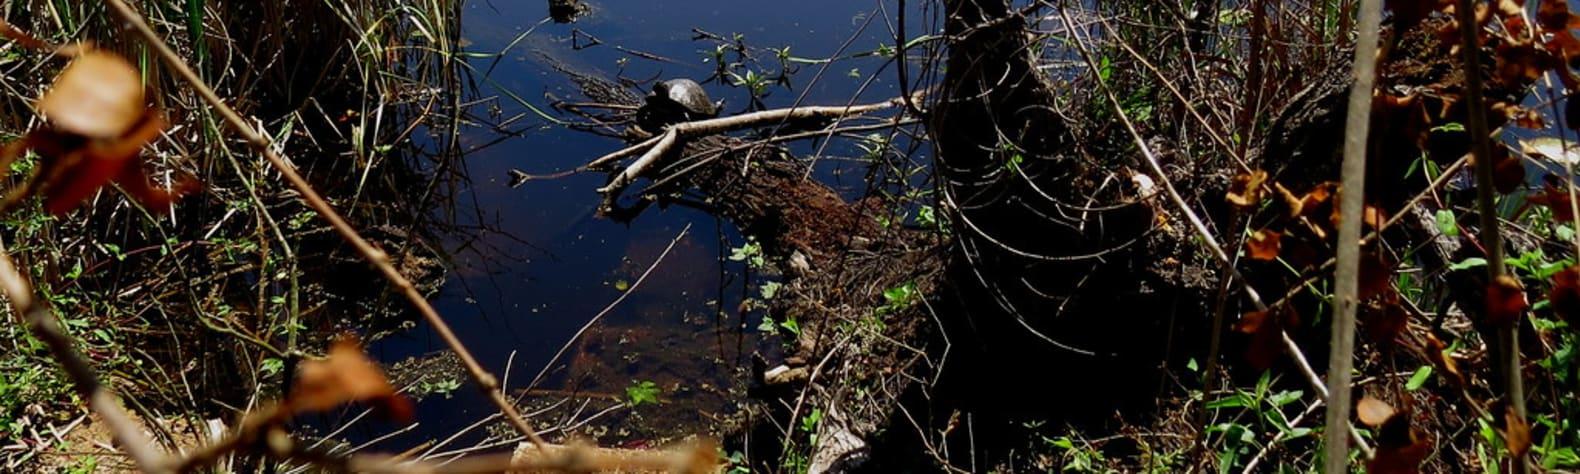 Sheldon Lake State Park